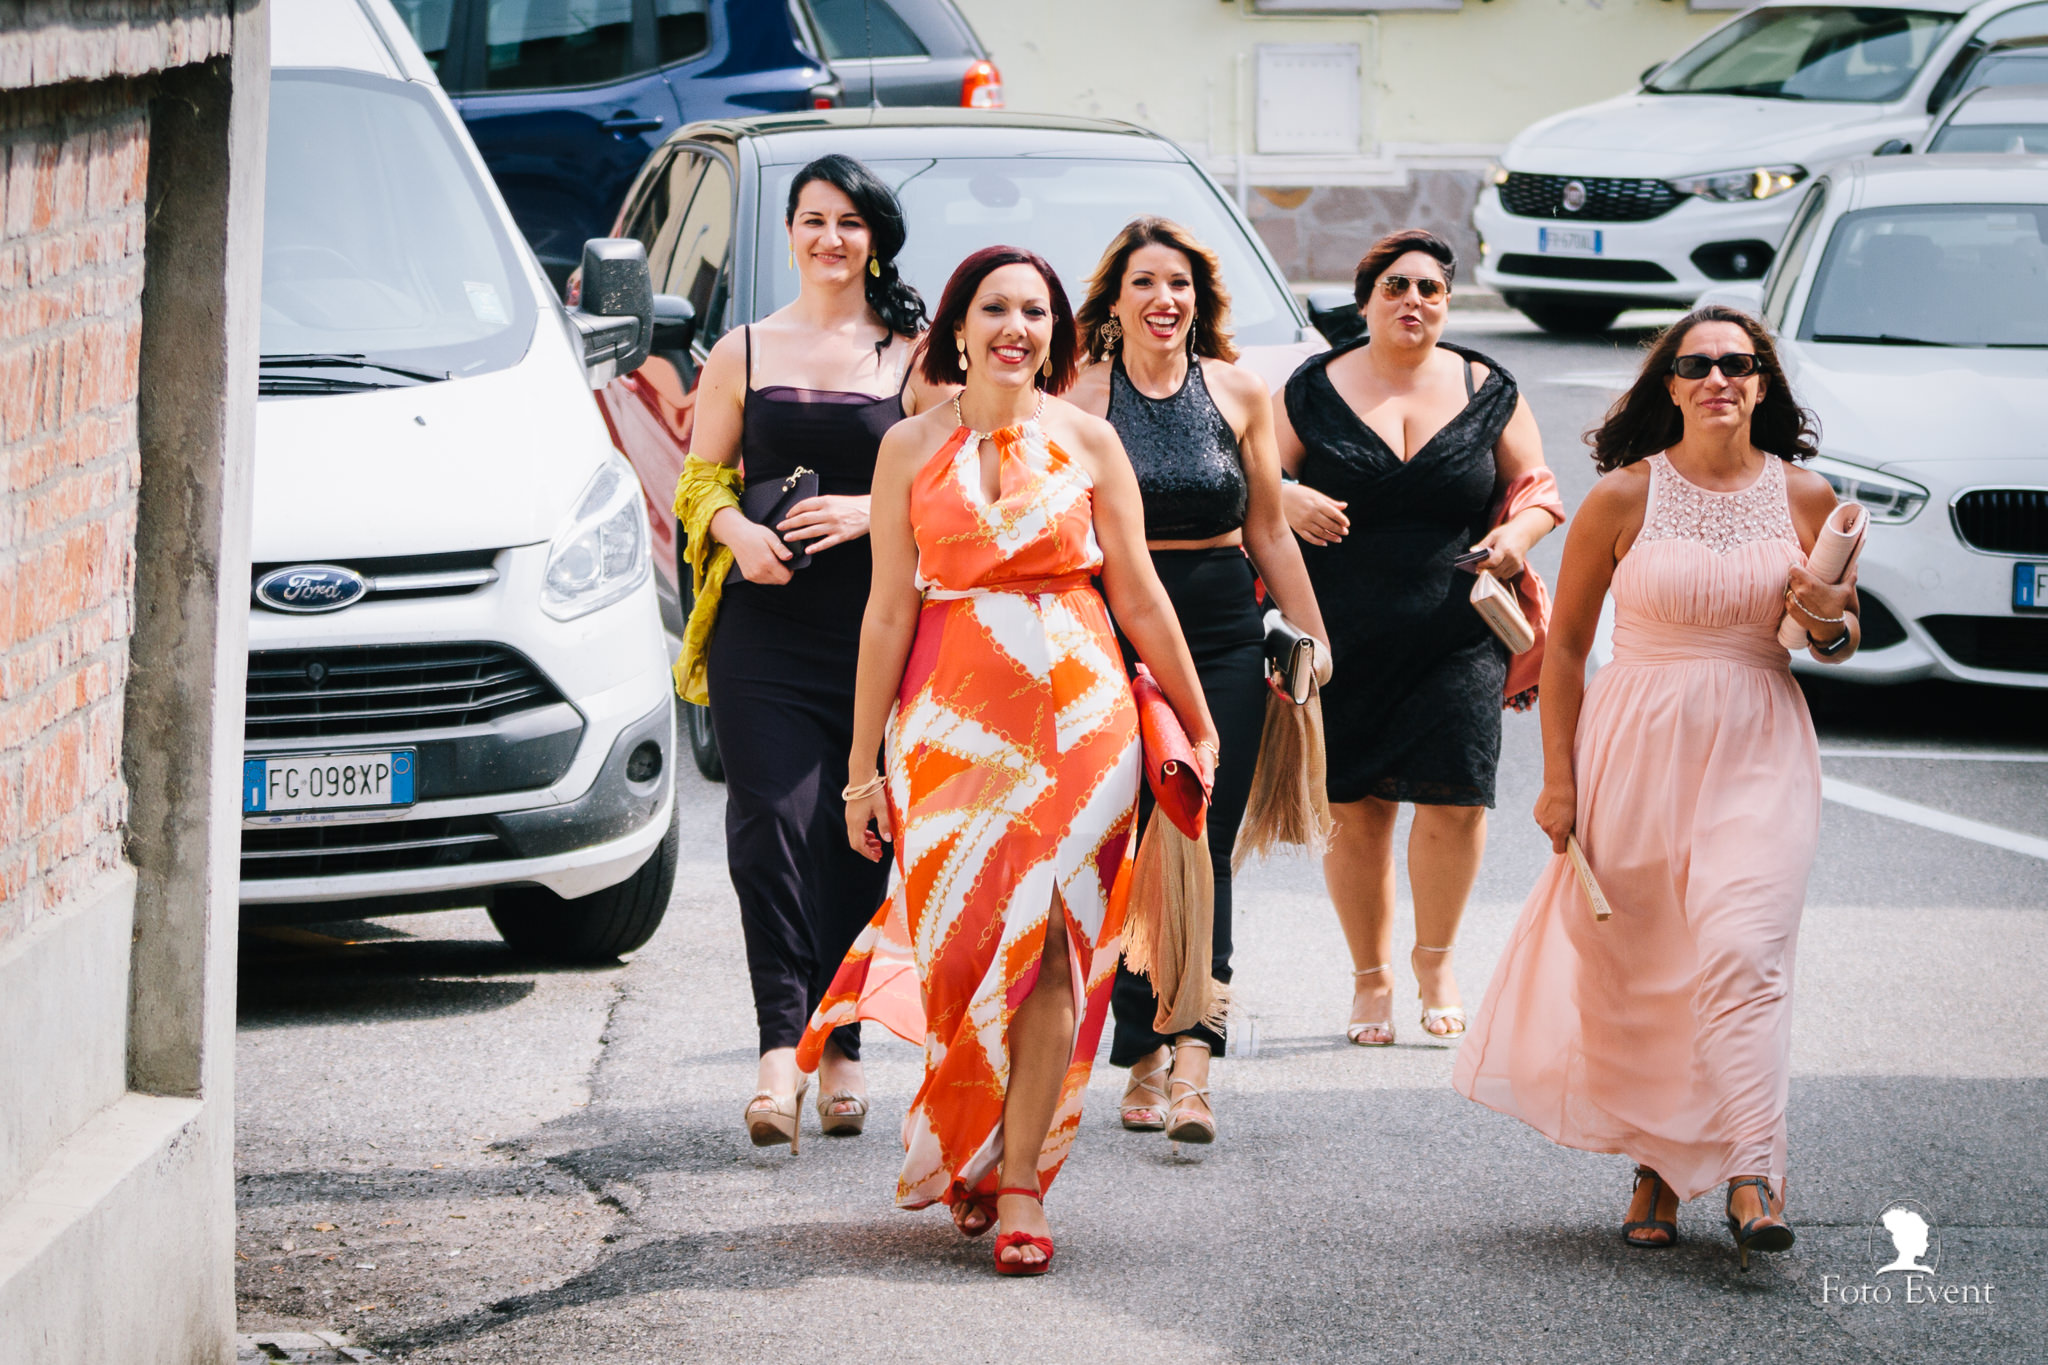 035-2019-07-27-Matrimonio-Valentina-e-Alessandro-Pettinari-zoom-241